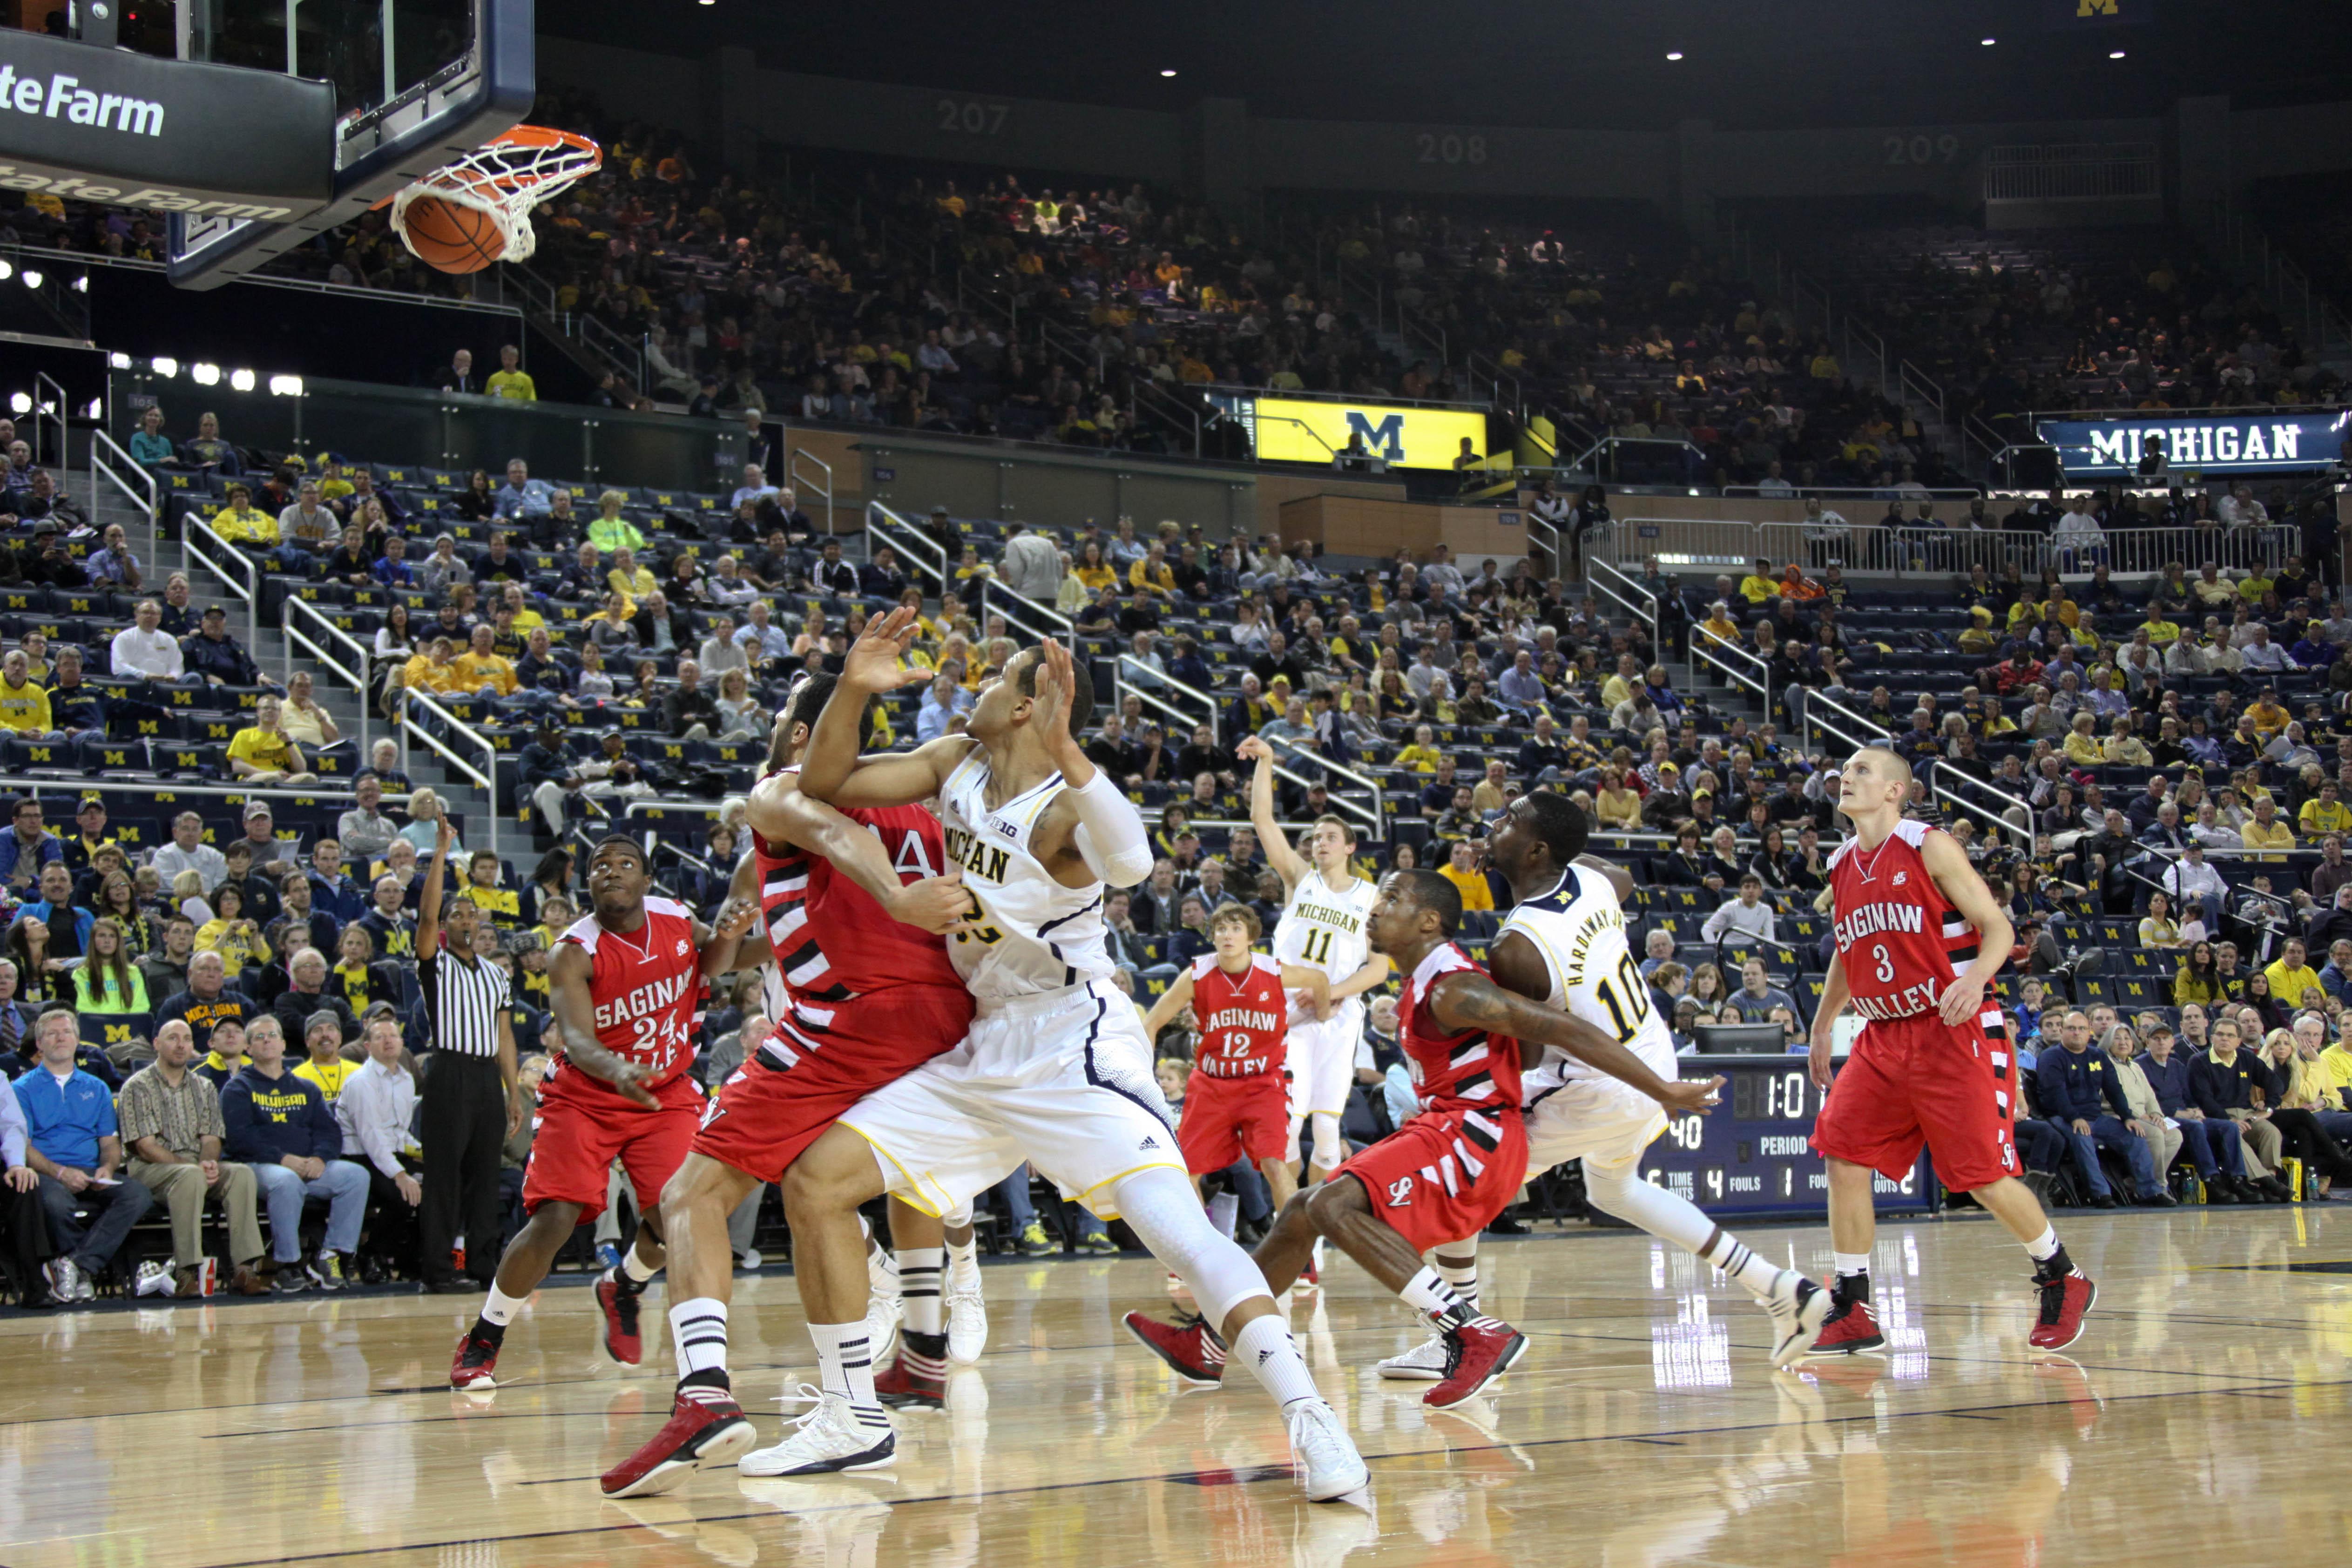 Michigan vs. Saginaw Valley State – 14